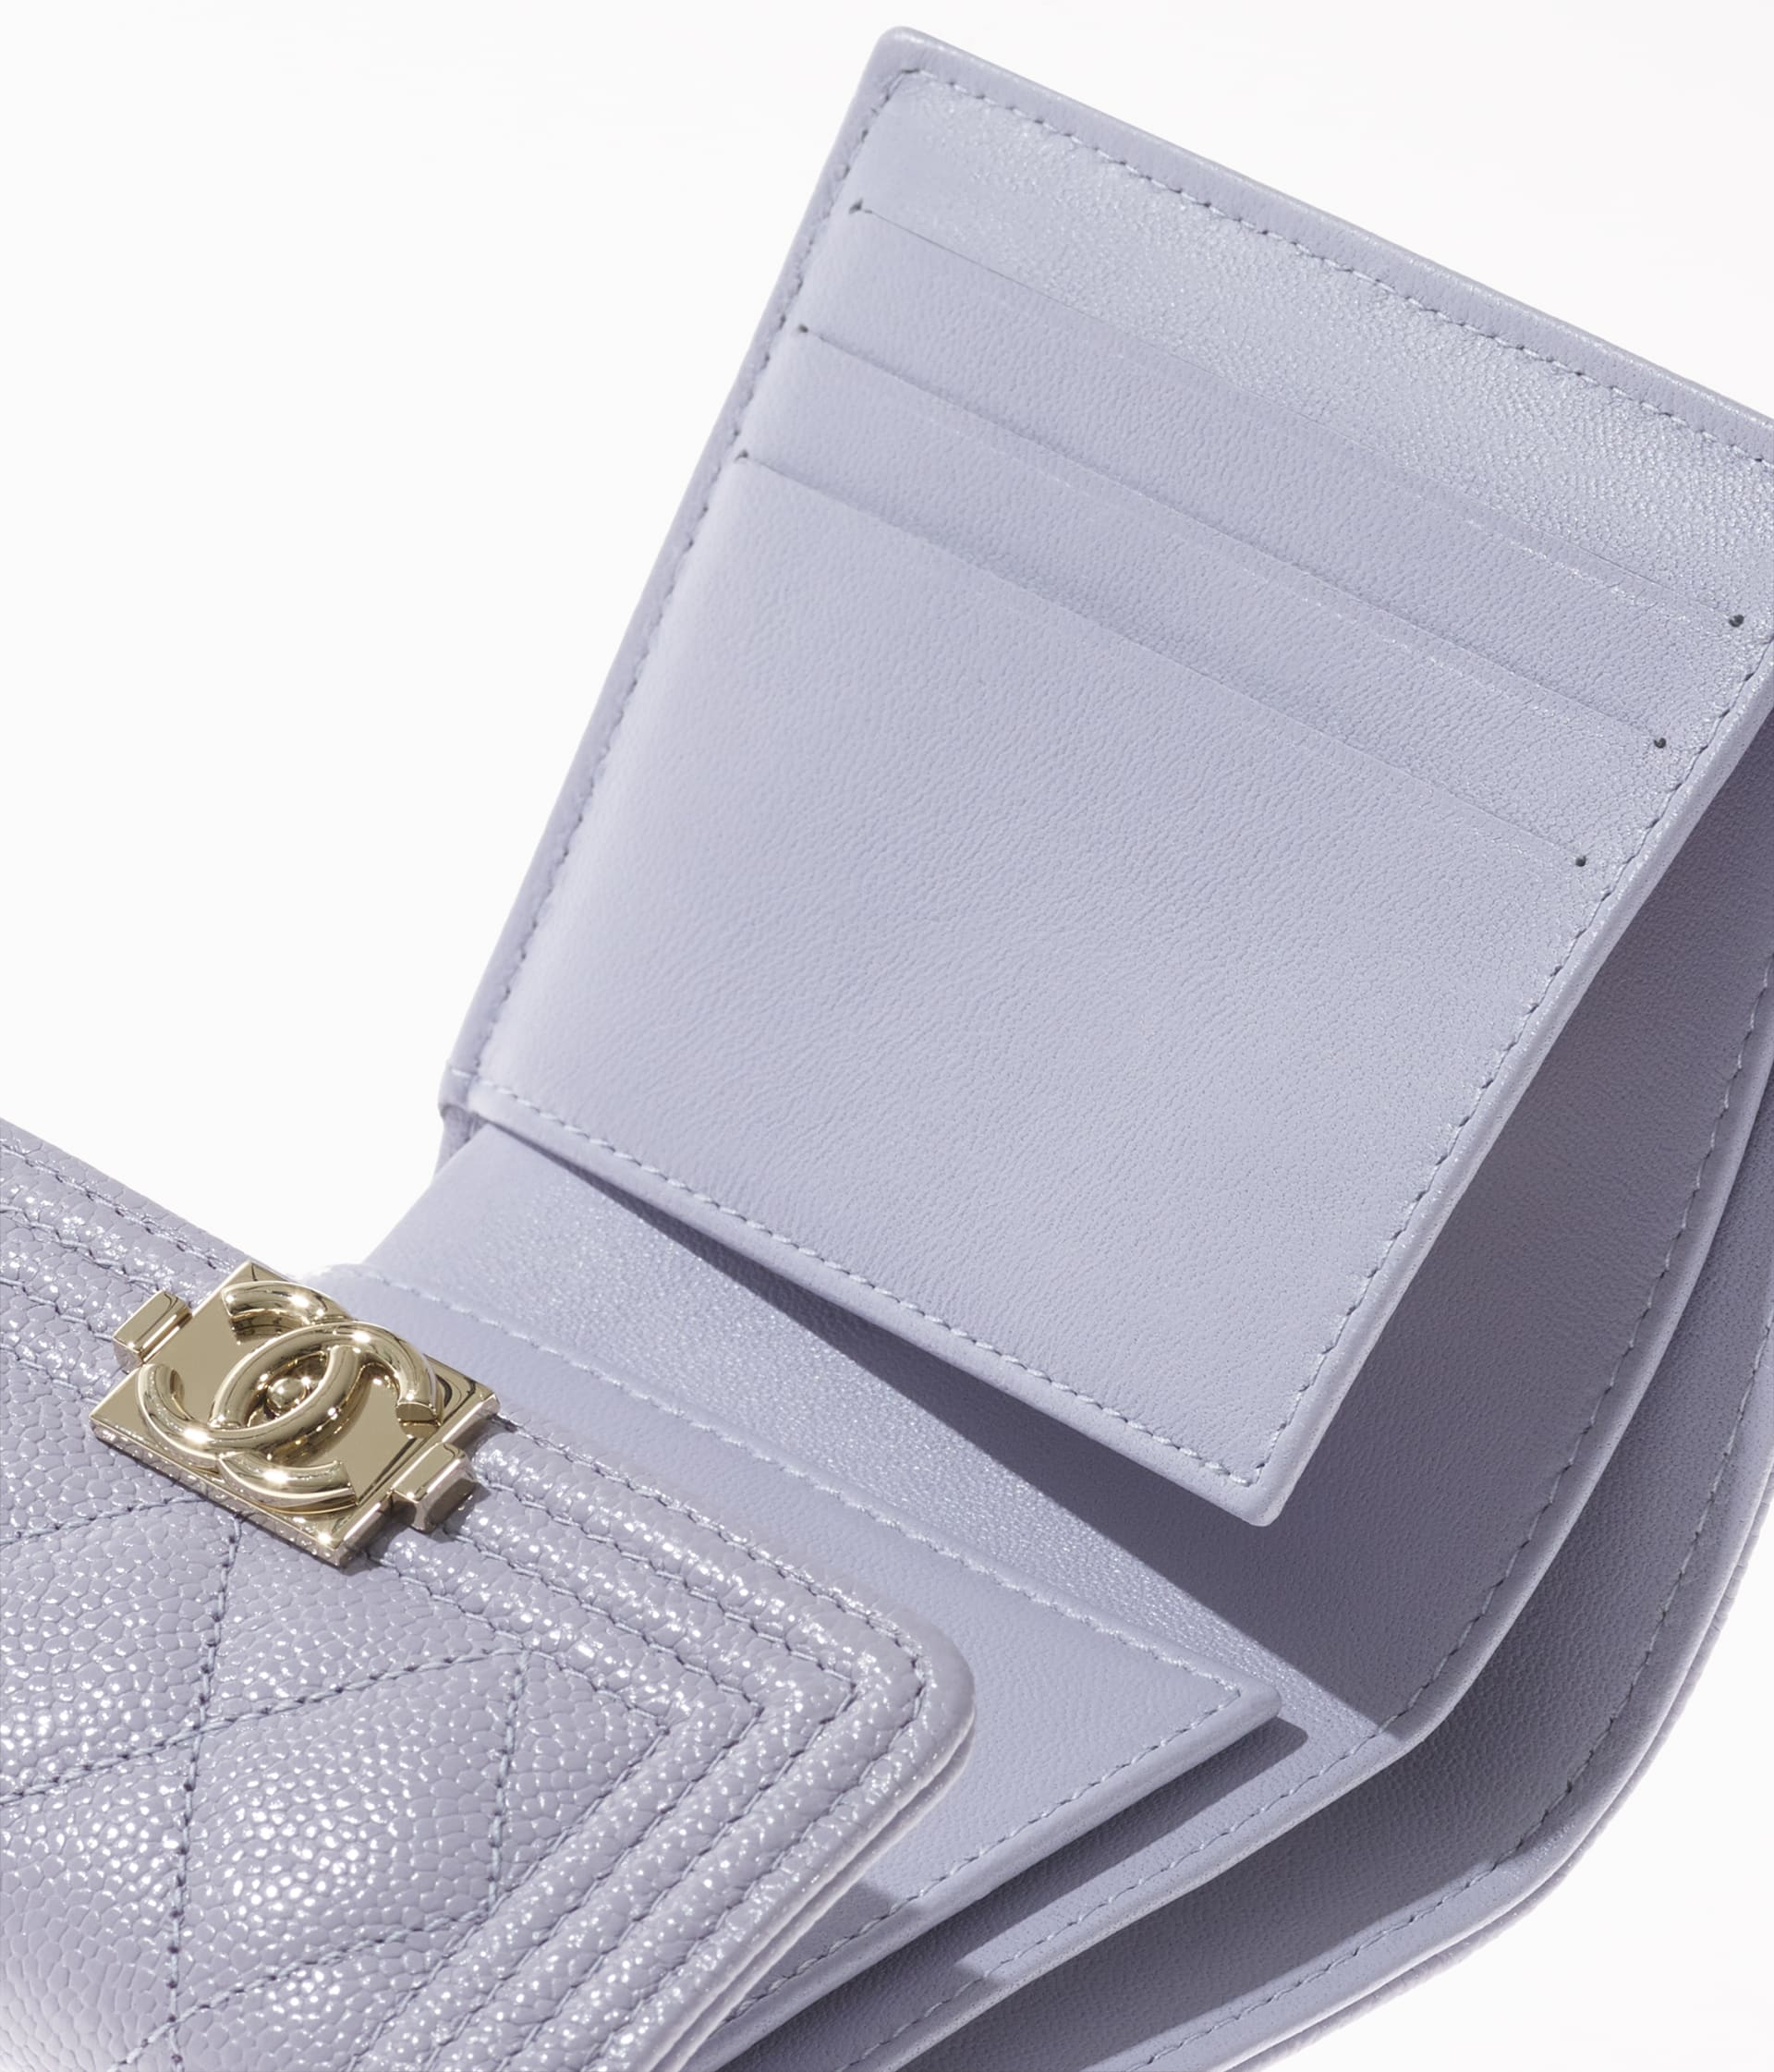 image 3 - BOY CHANEL Small Flap Wallet - Grained Calfskin & Gold-Tone Metal - Light Purple